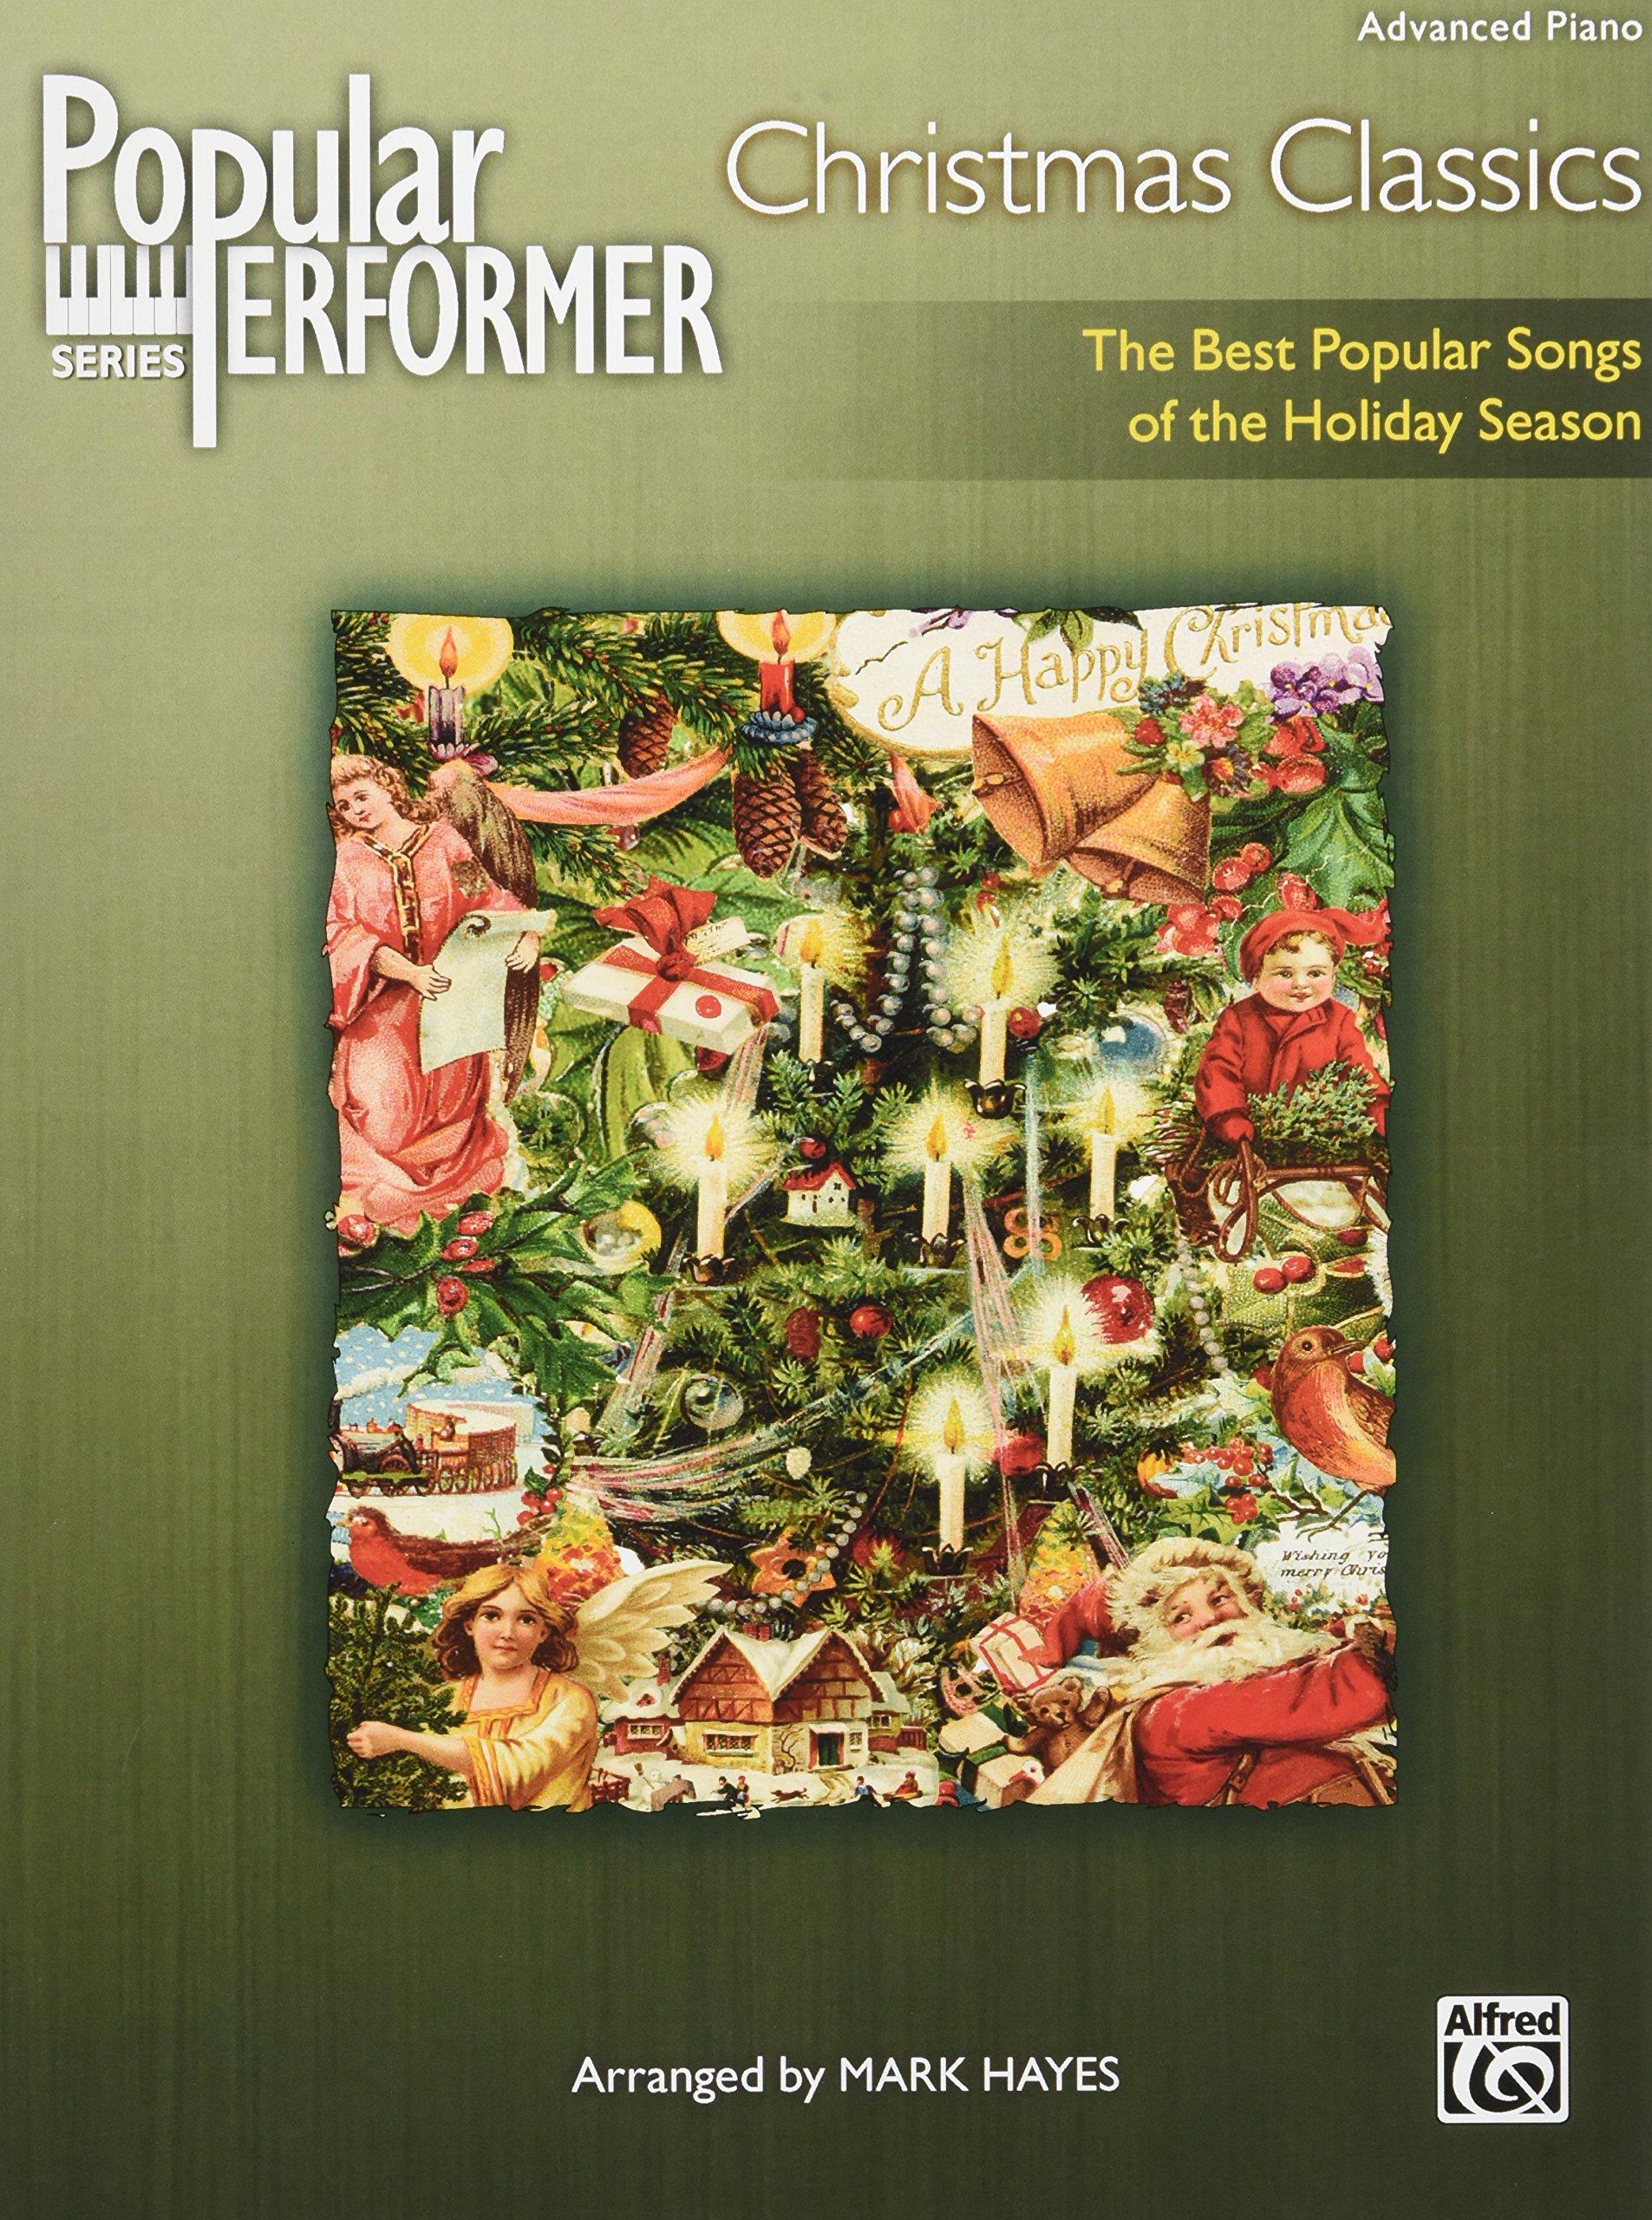 amazon popular performer christmas classics the best popular